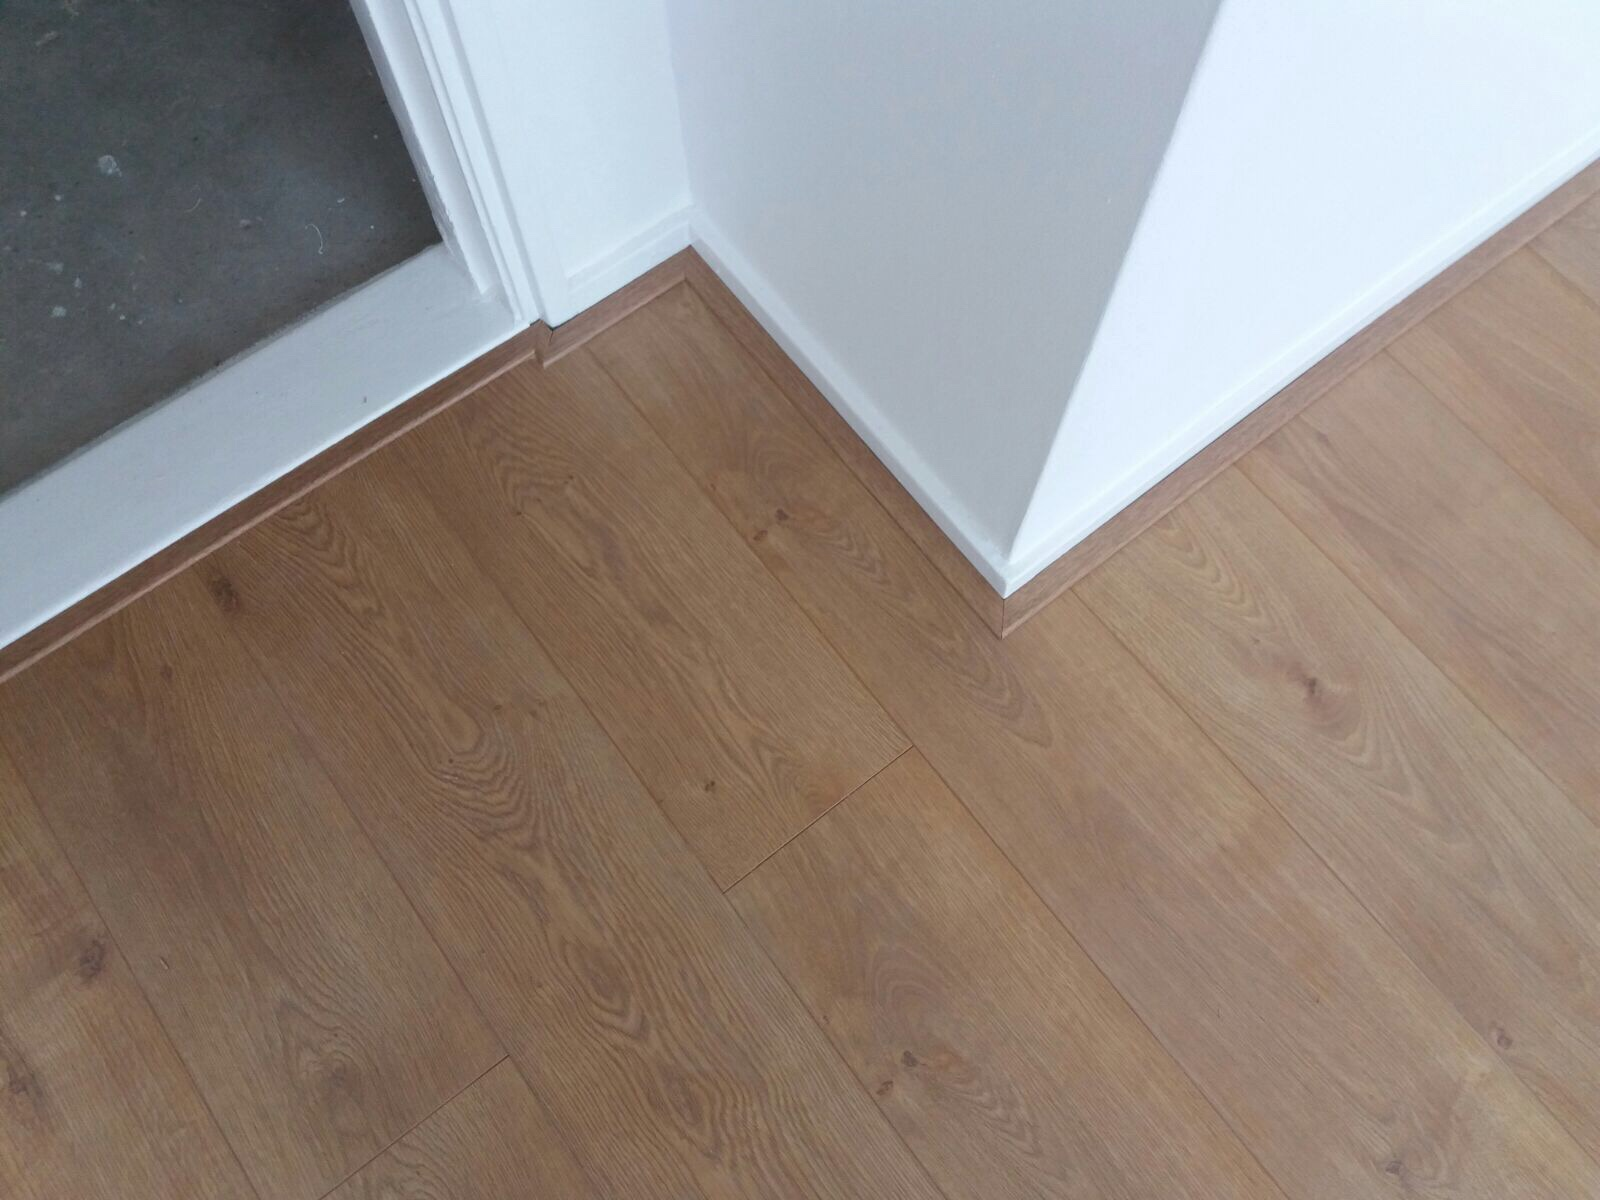 Laminaat Leggen Ondervloer : Slaapkamer laminaat ondervloer leggen m werkspot